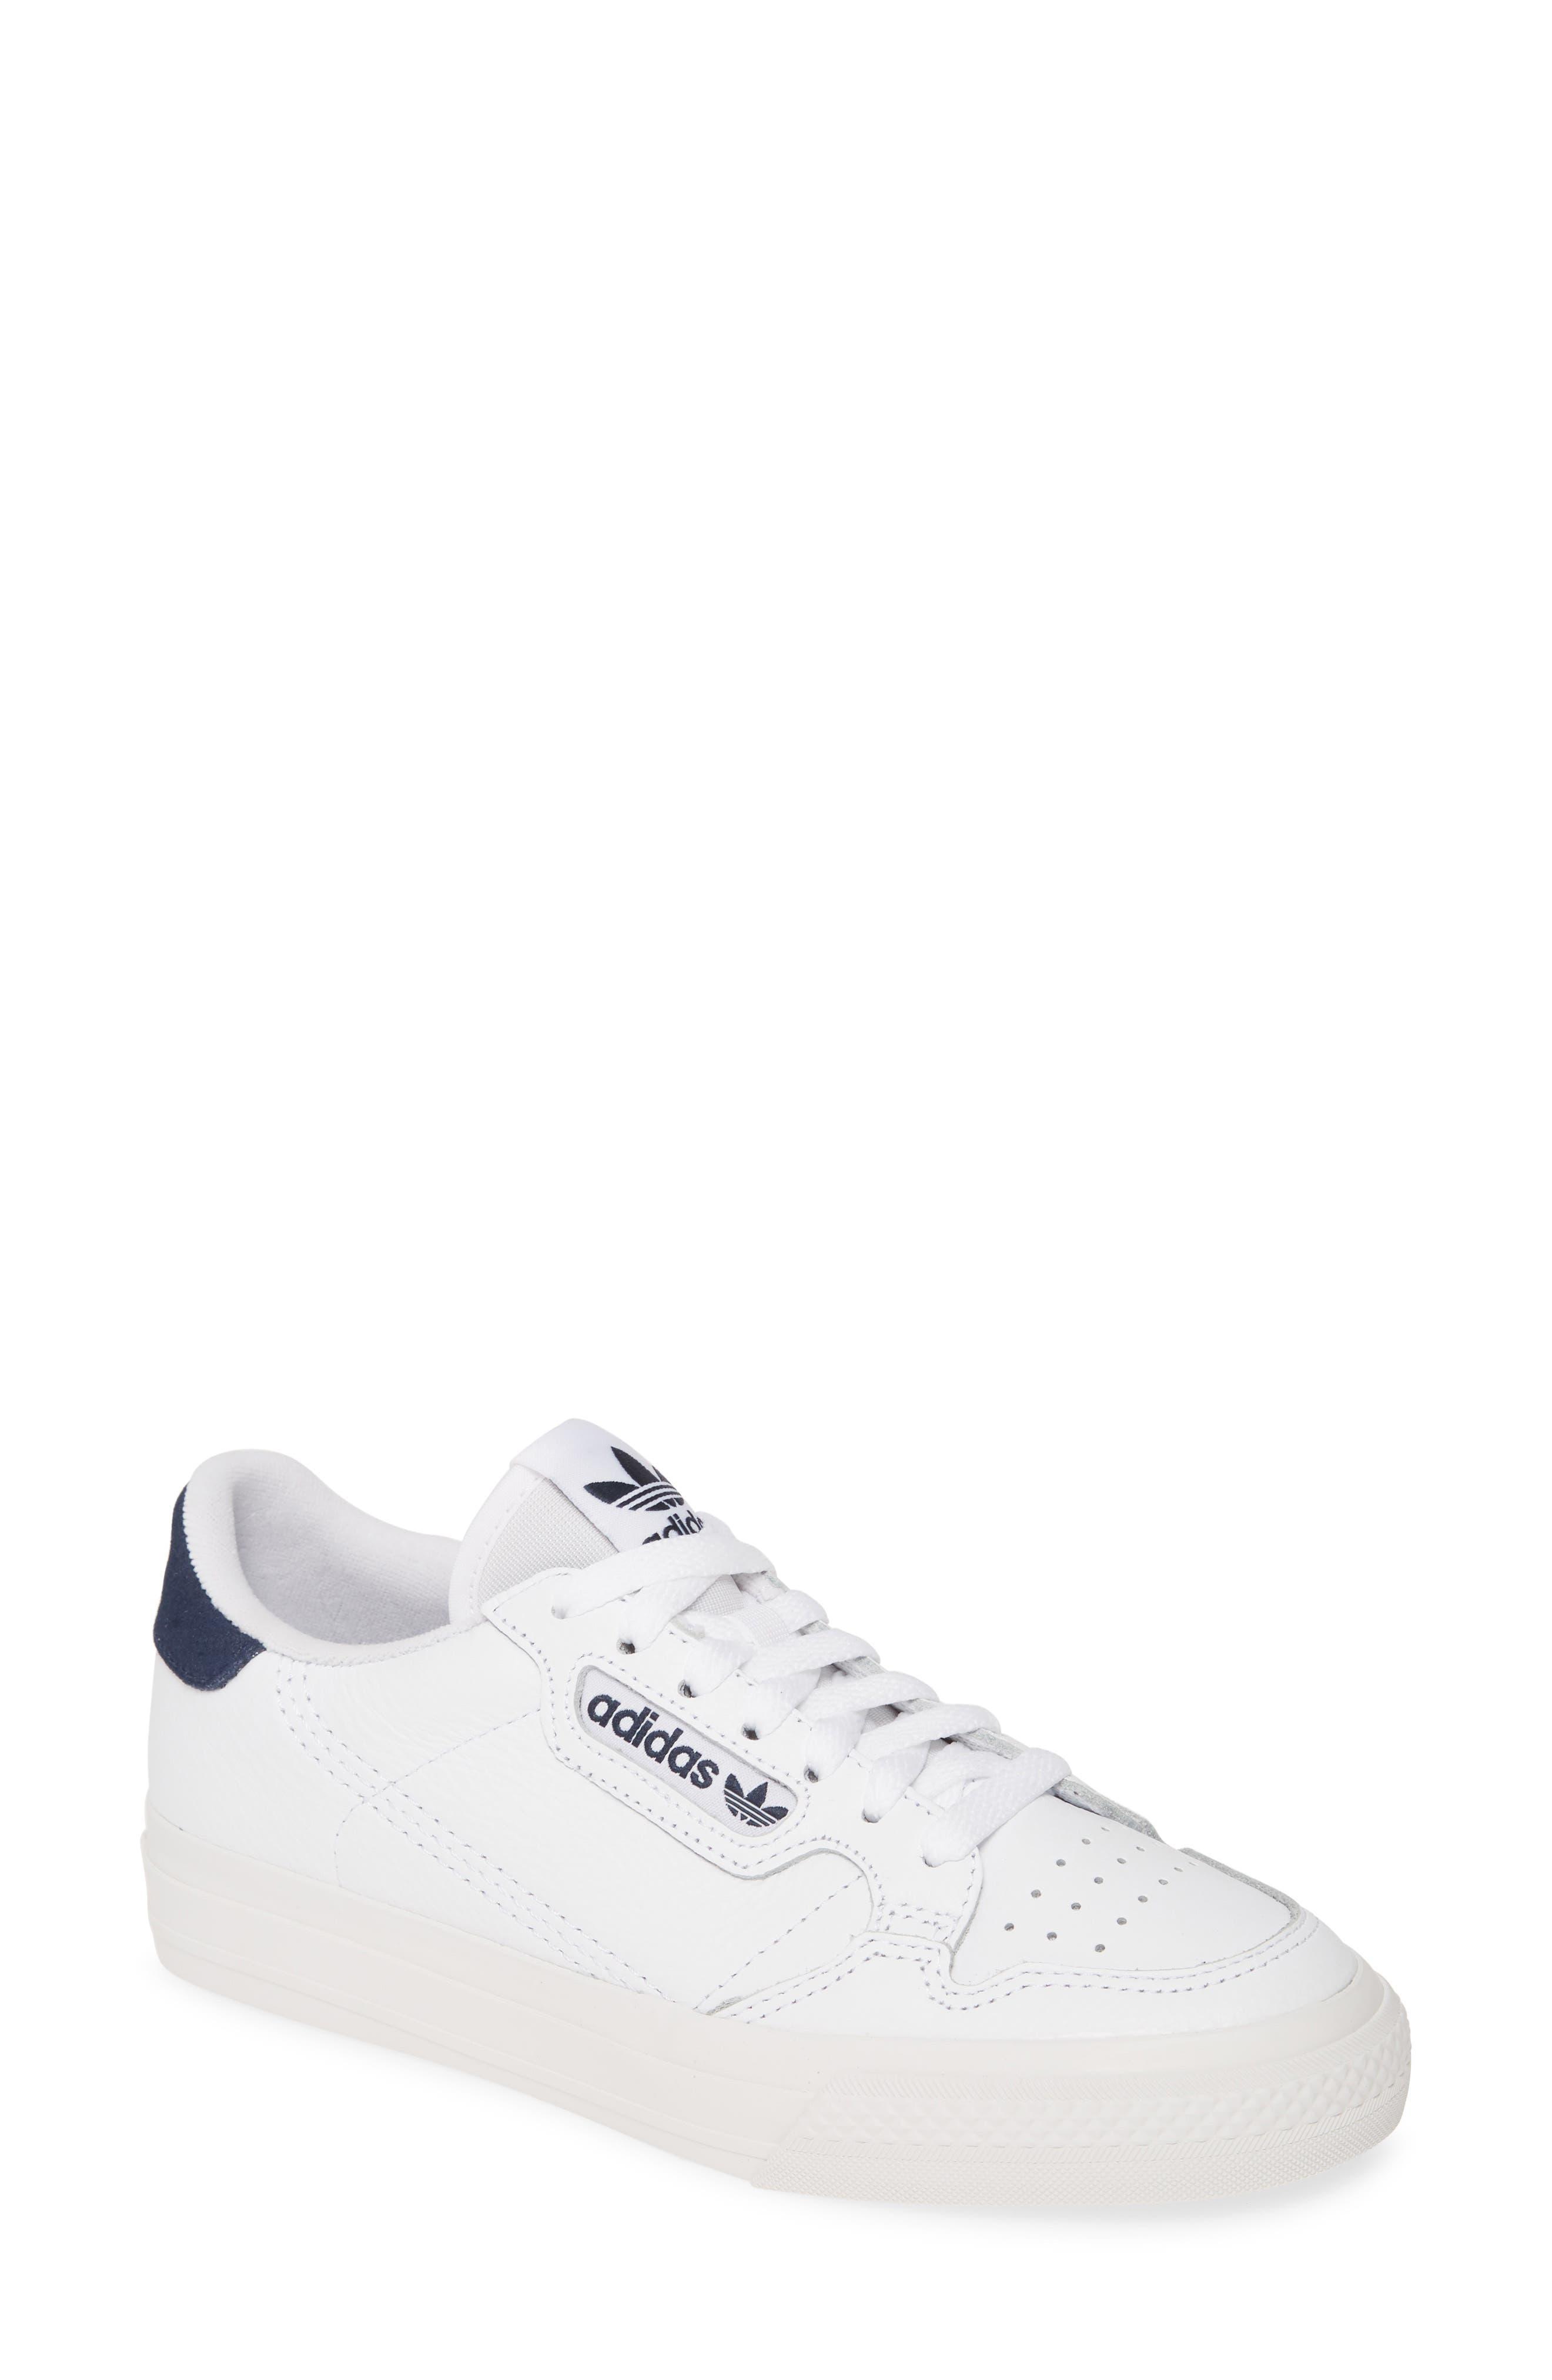 Adidas Continental Vulc Sneaker, / 7 Men